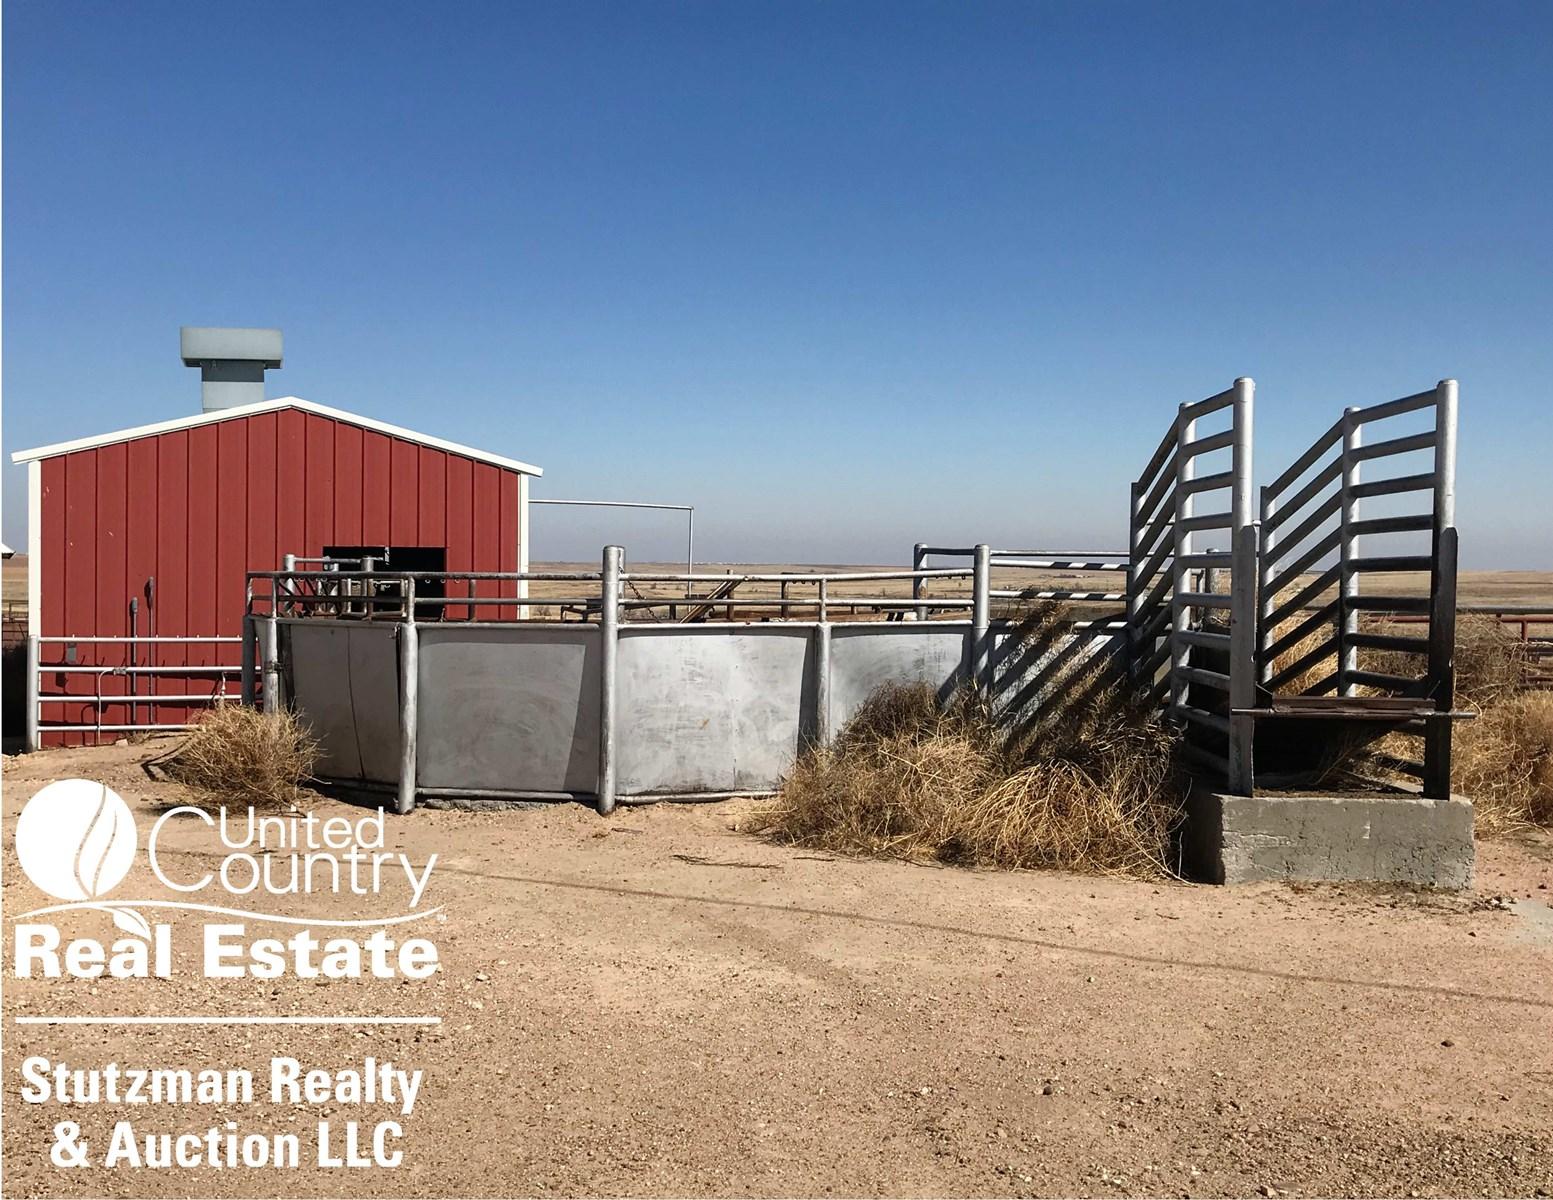 Commercial Feedyard For Sale In Western Kansas